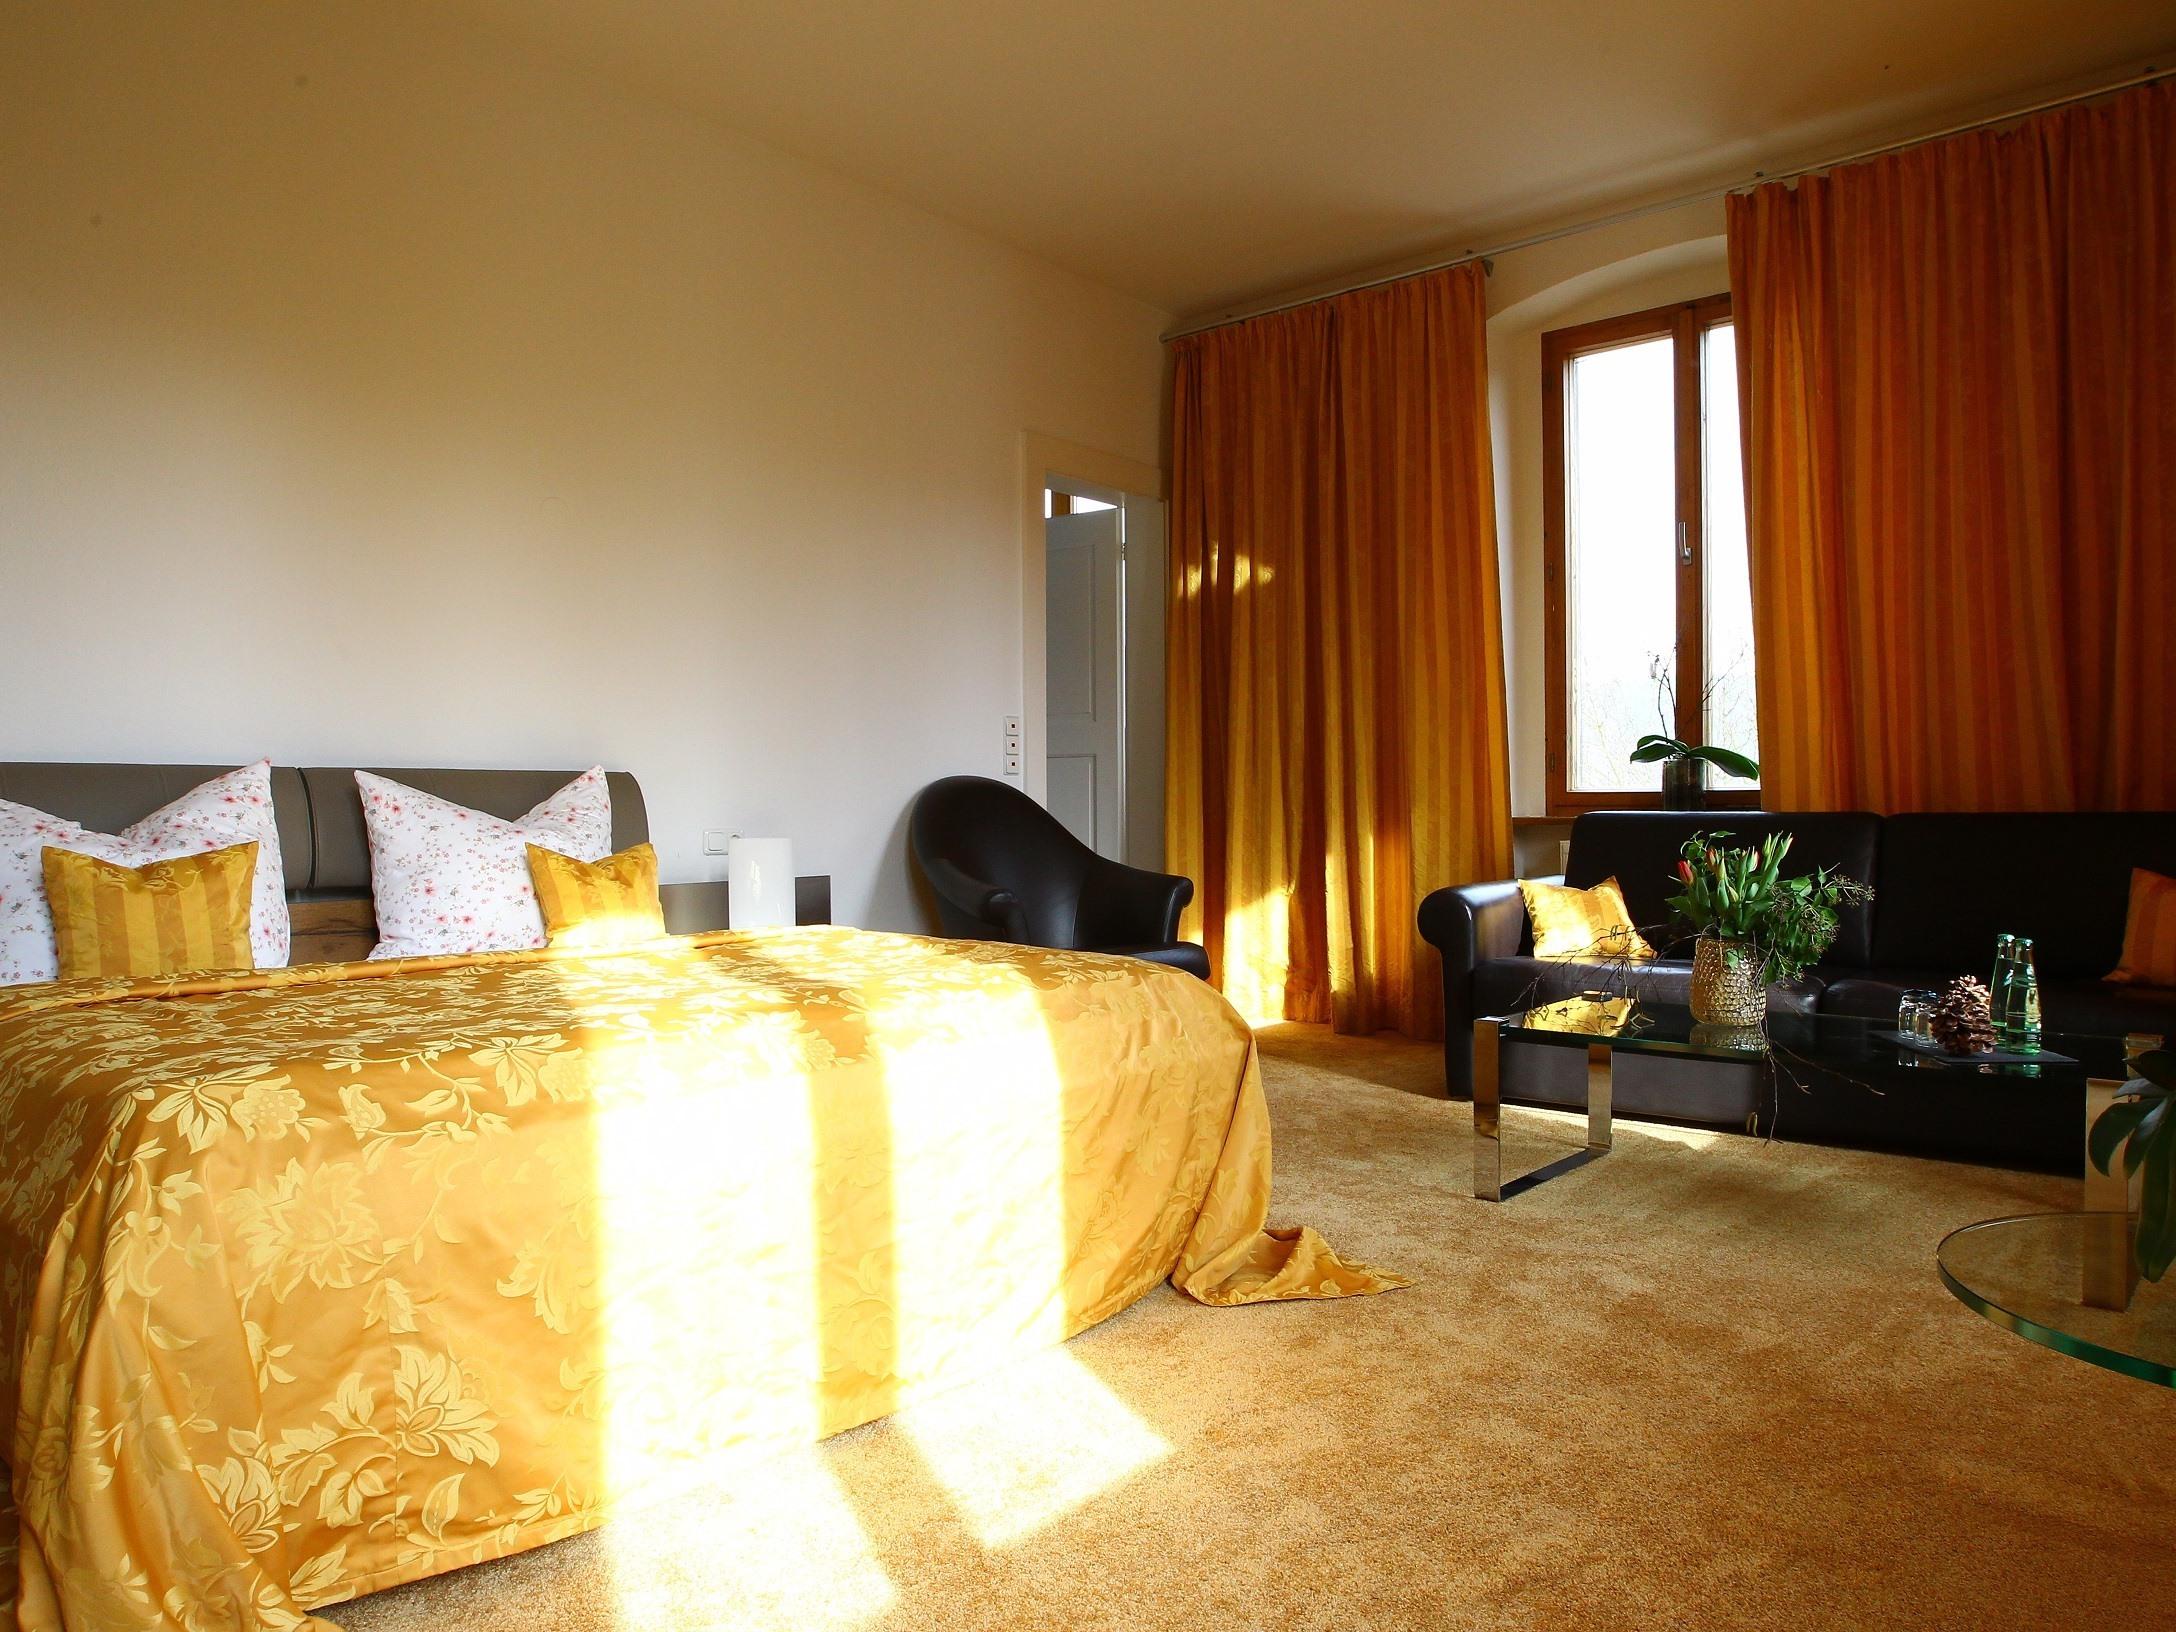 Familienzimmer-Exklusiv-Ensuite Dusche-Gartenblick-Schloss 202